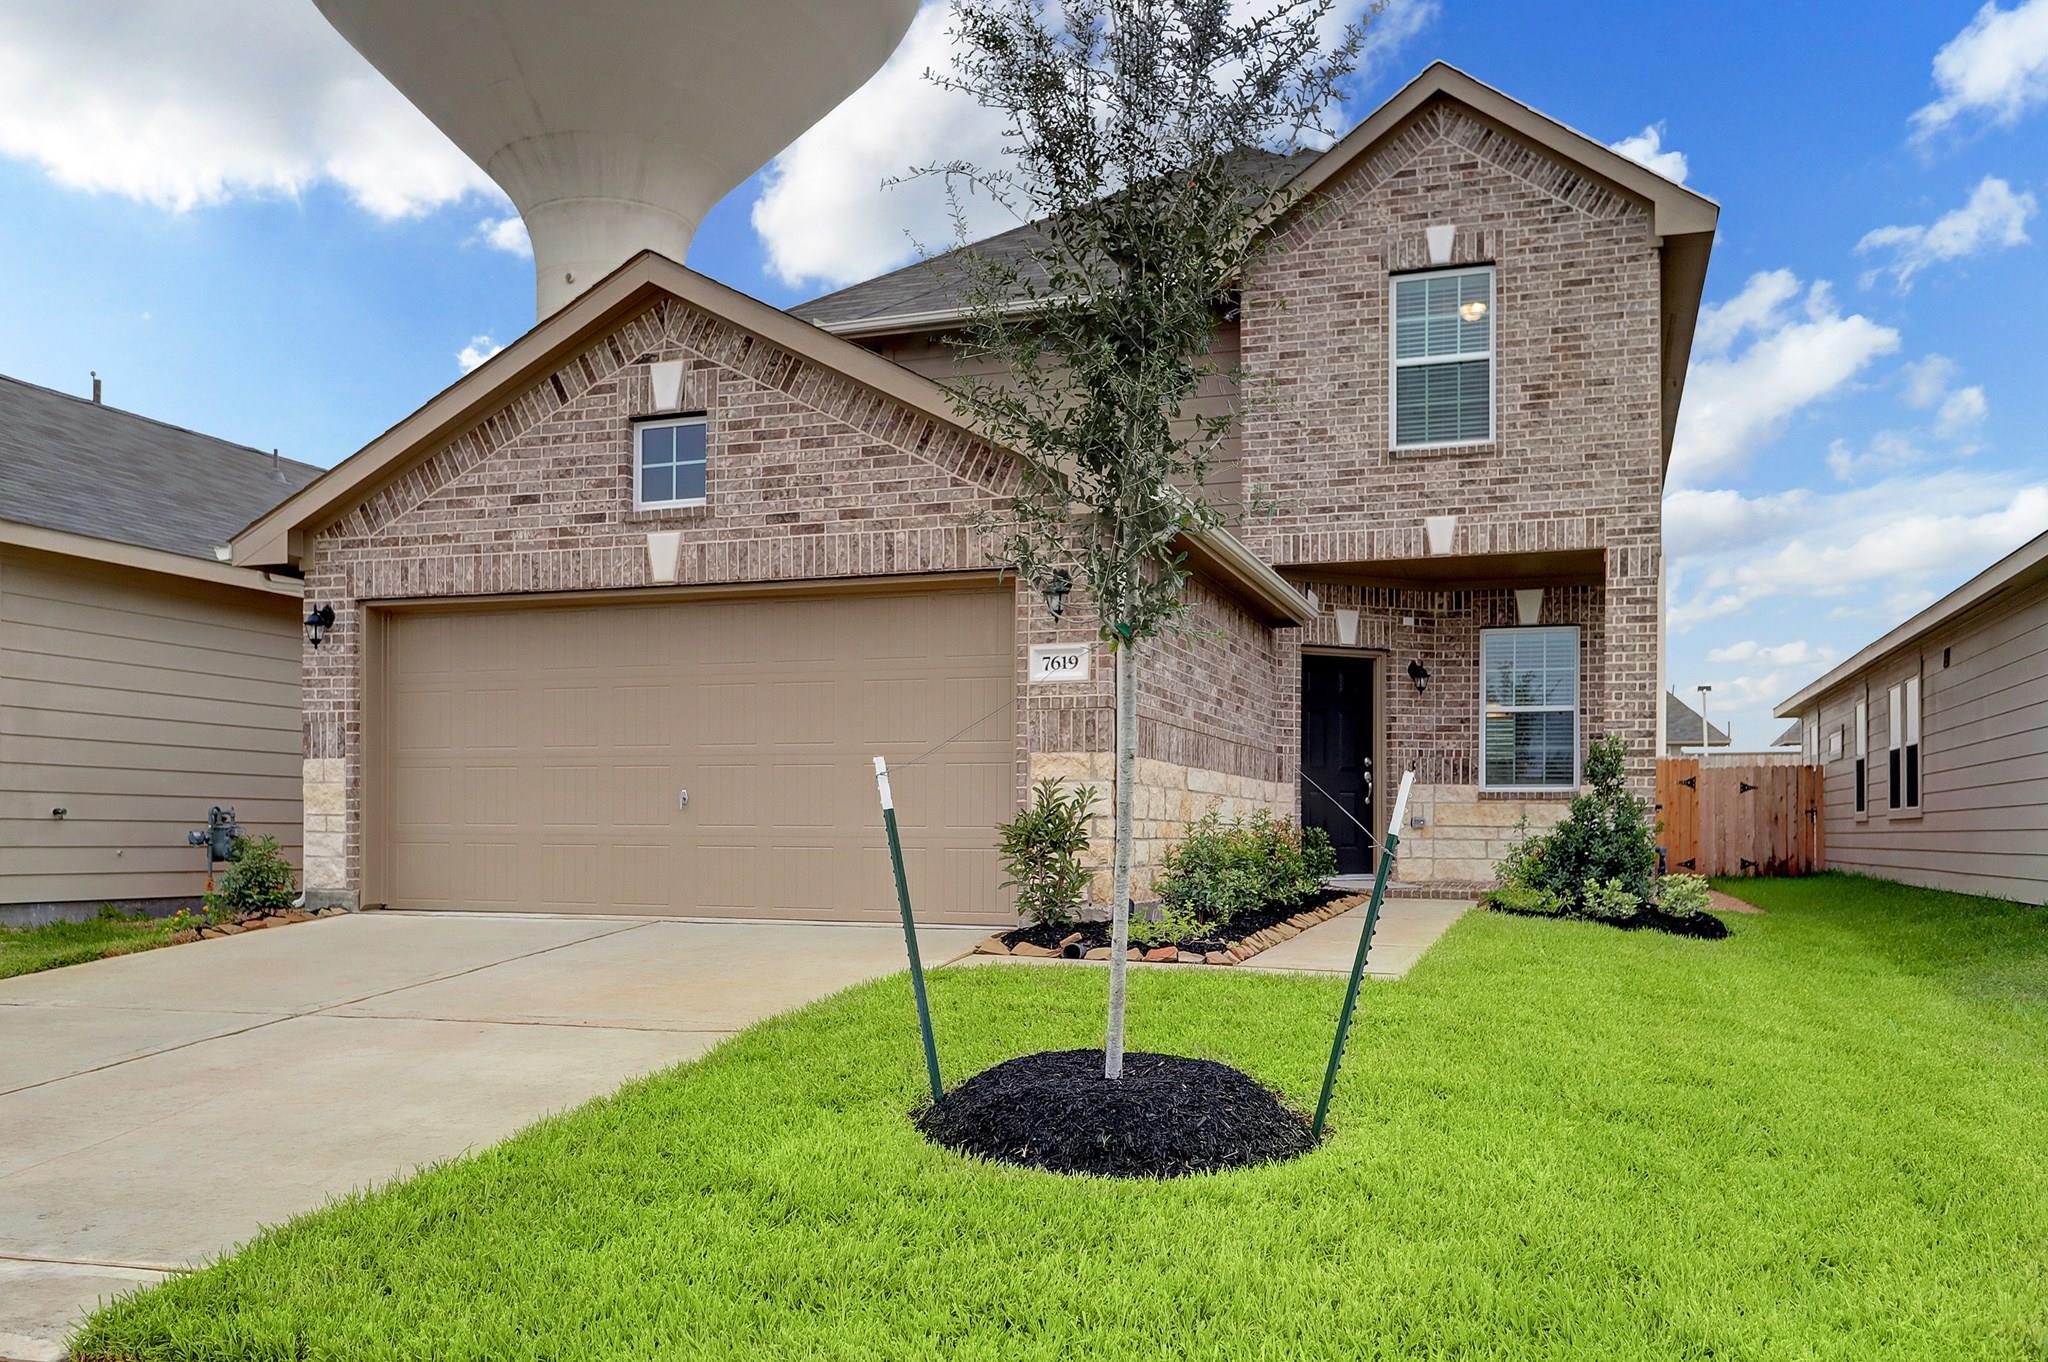 7619 Mesa Ranch Trail Property Photo - Houston, TX real estate listing